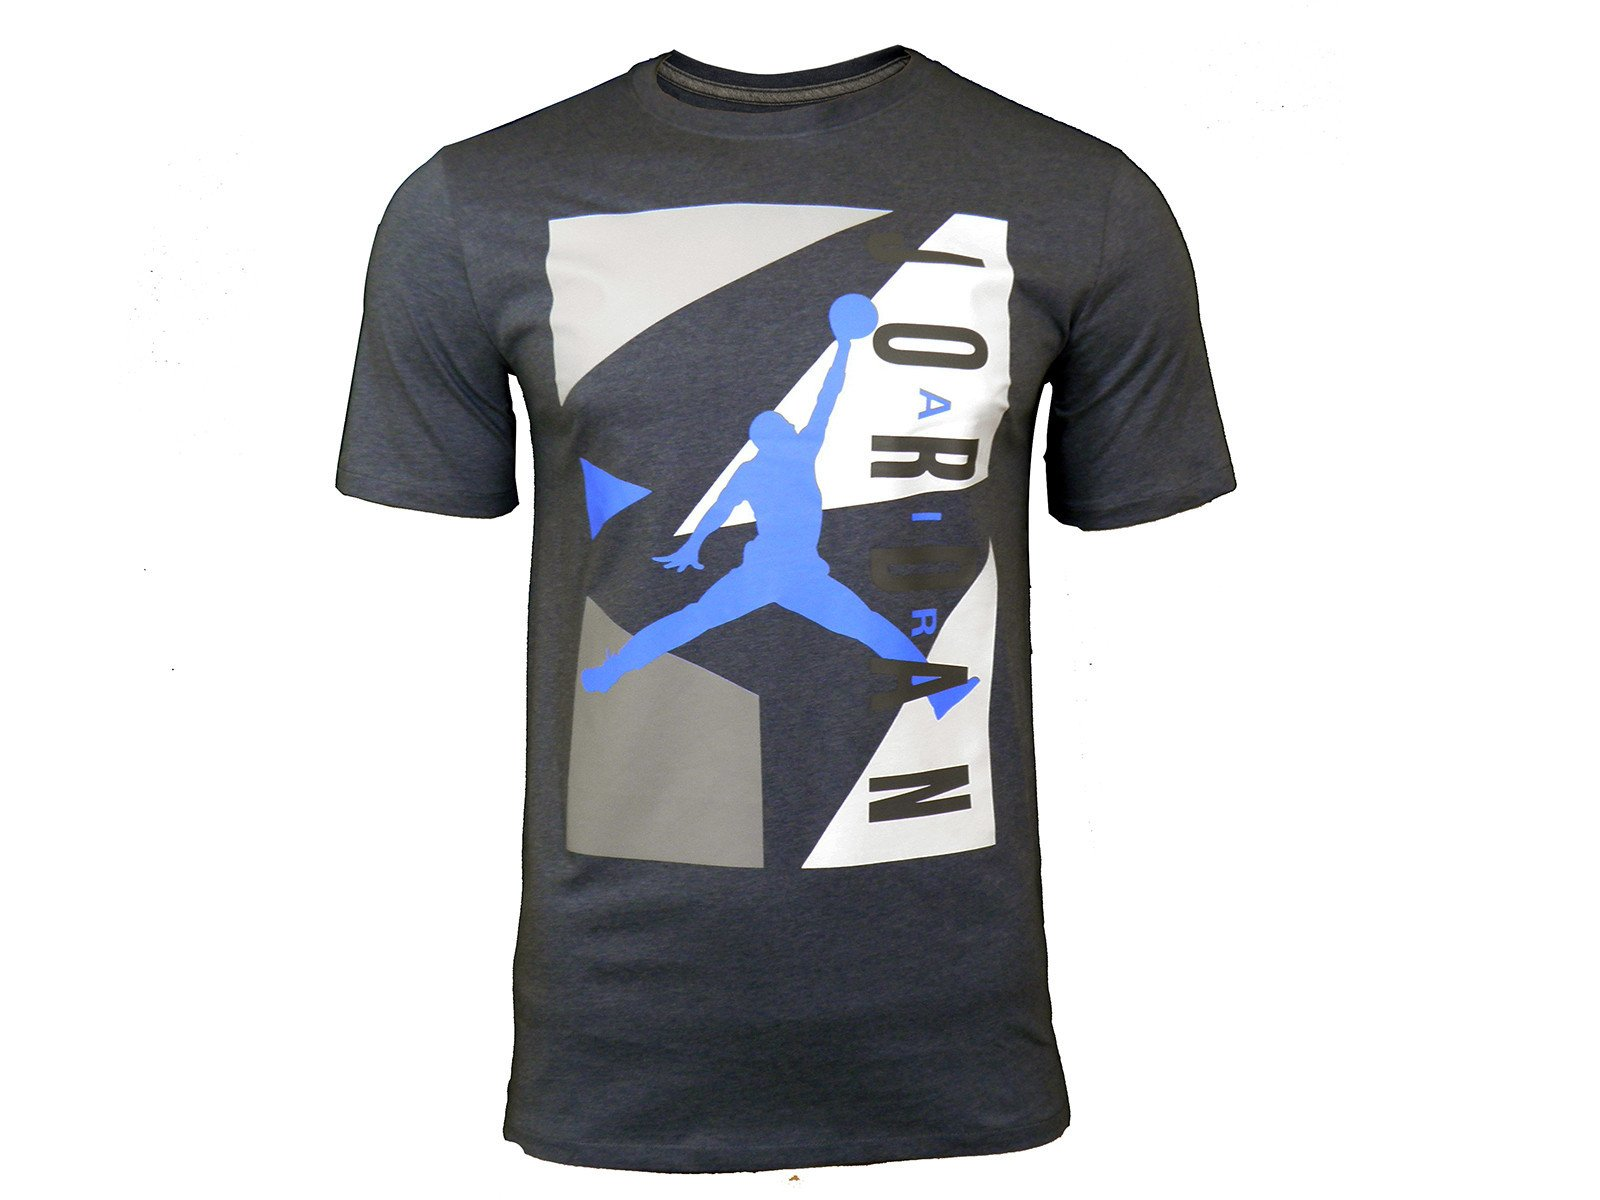 Nike jordan retro tee t shirt 659155 497 basketball for Retro t shirts uk